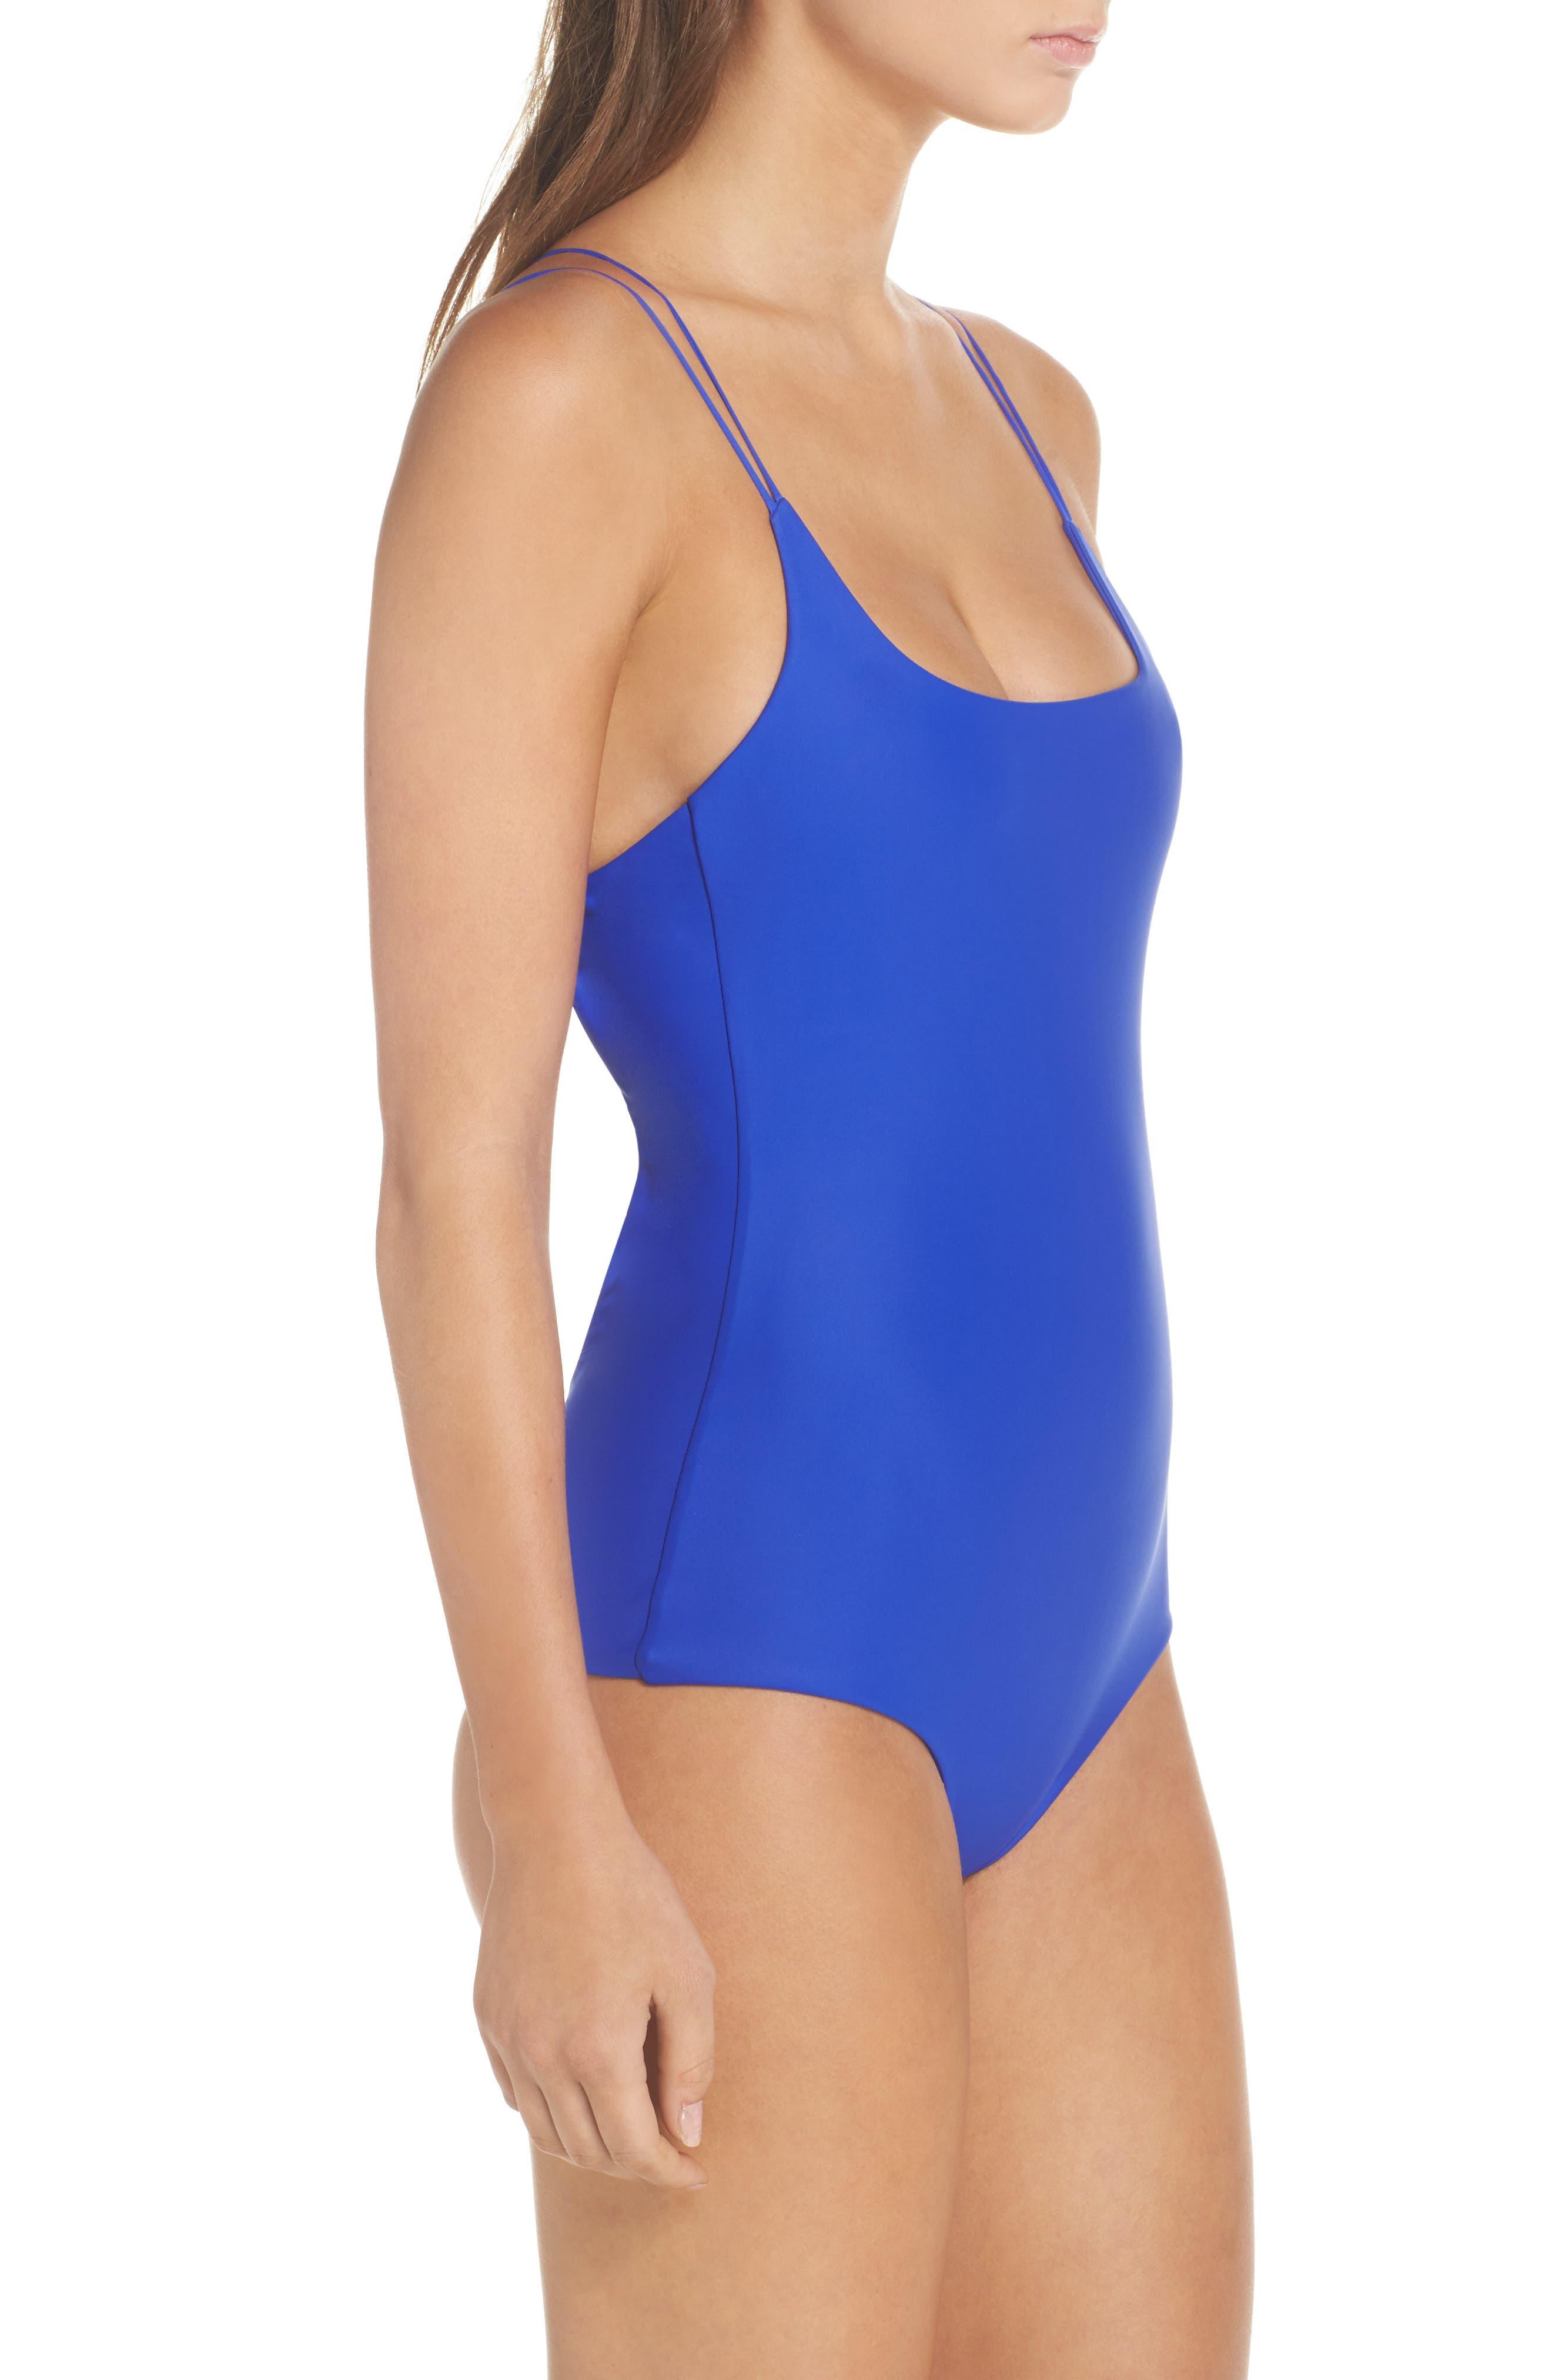 Kilauea One-Piece Swimsuit,                             Alternate thumbnail 3, color,                             400